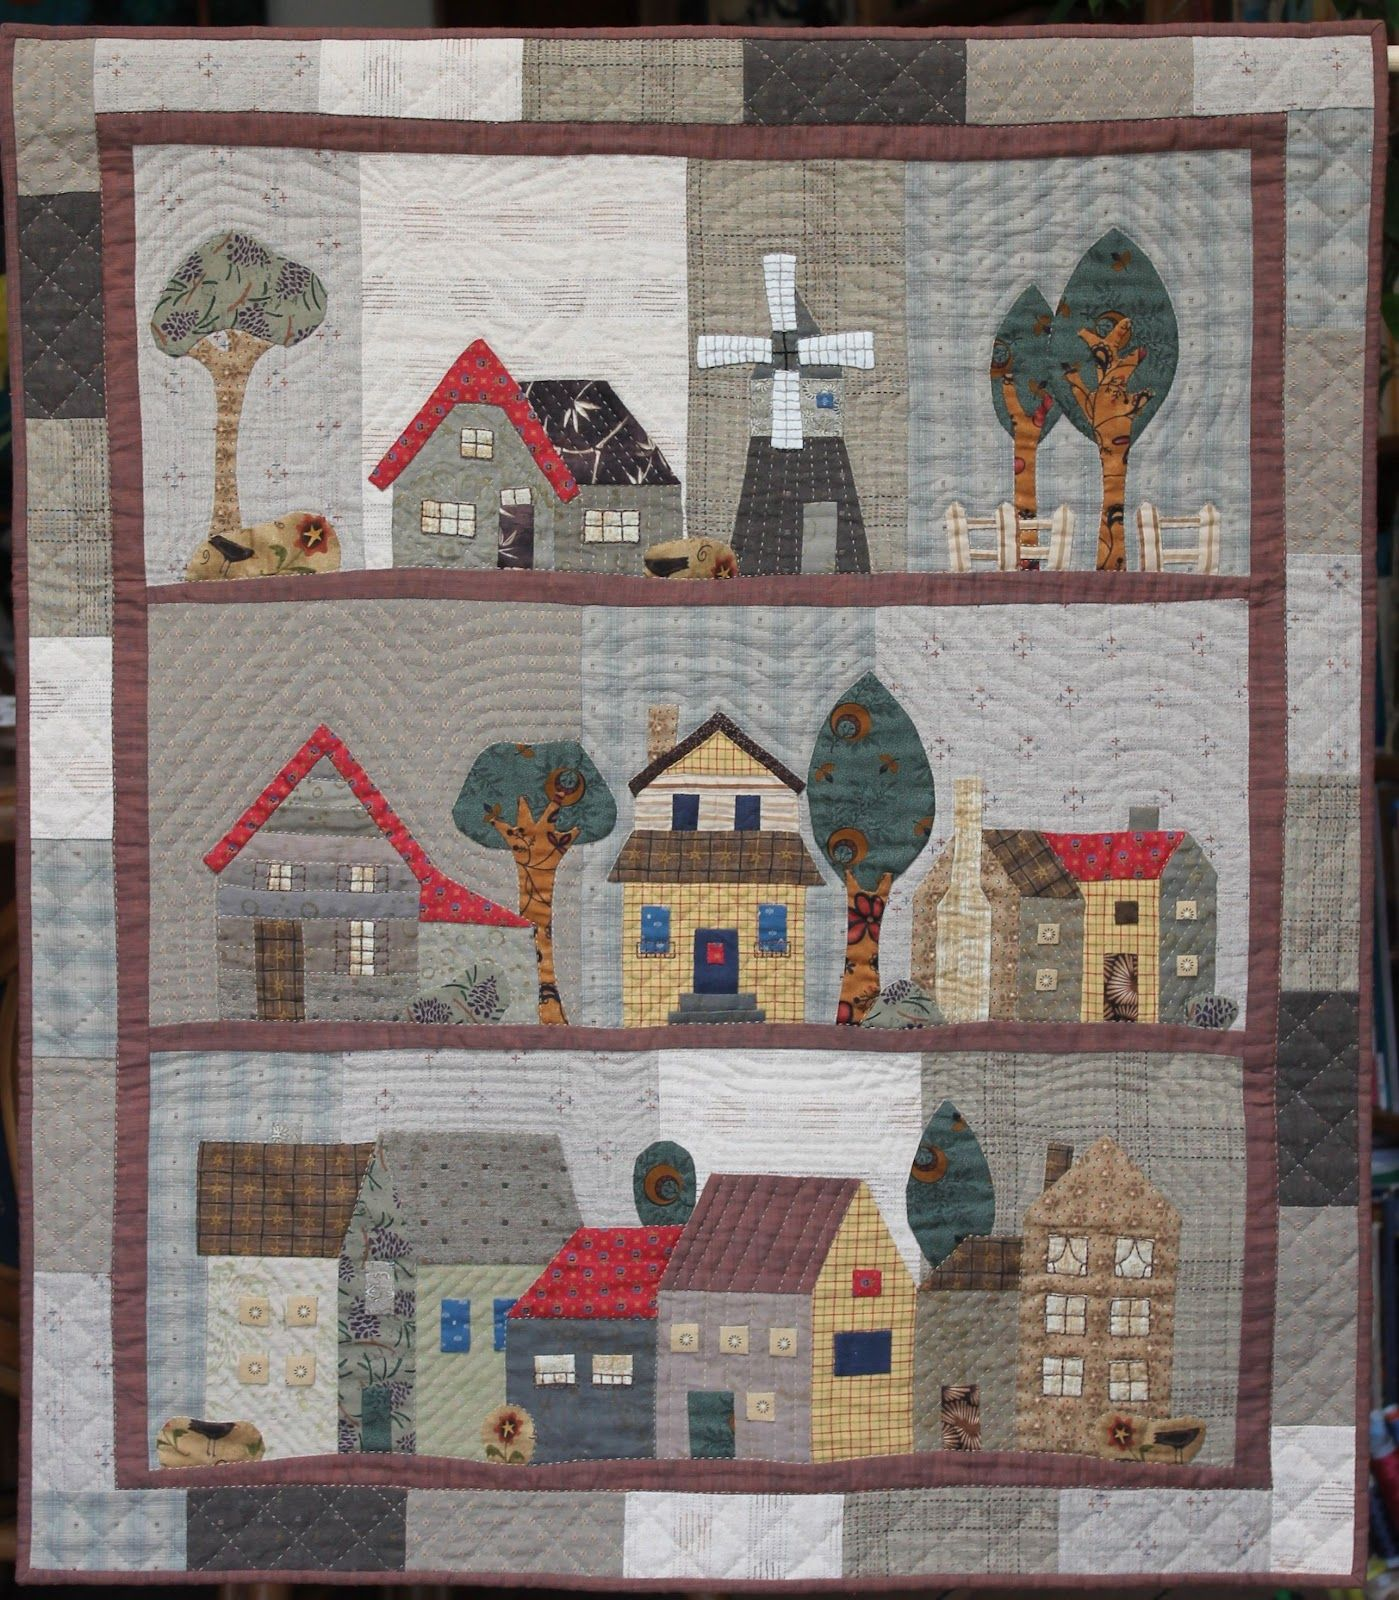 kindermuts german short rows in knitting - Google zoeken